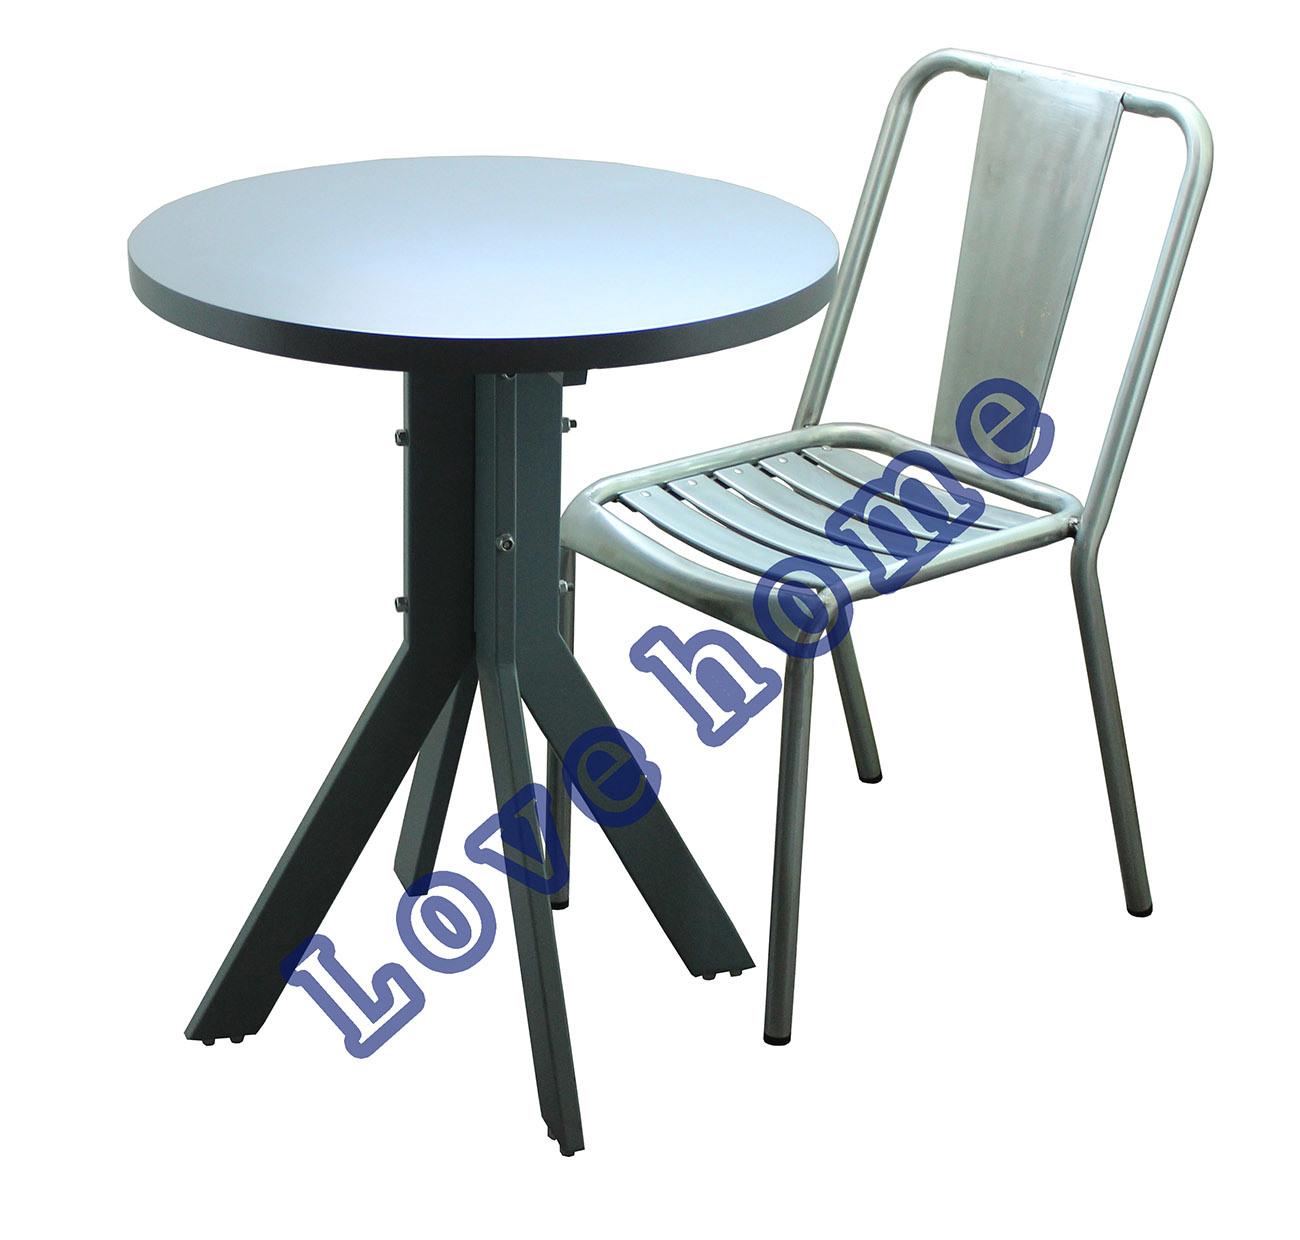 Modern Dining Restaurant Metal Leg Wooden Table